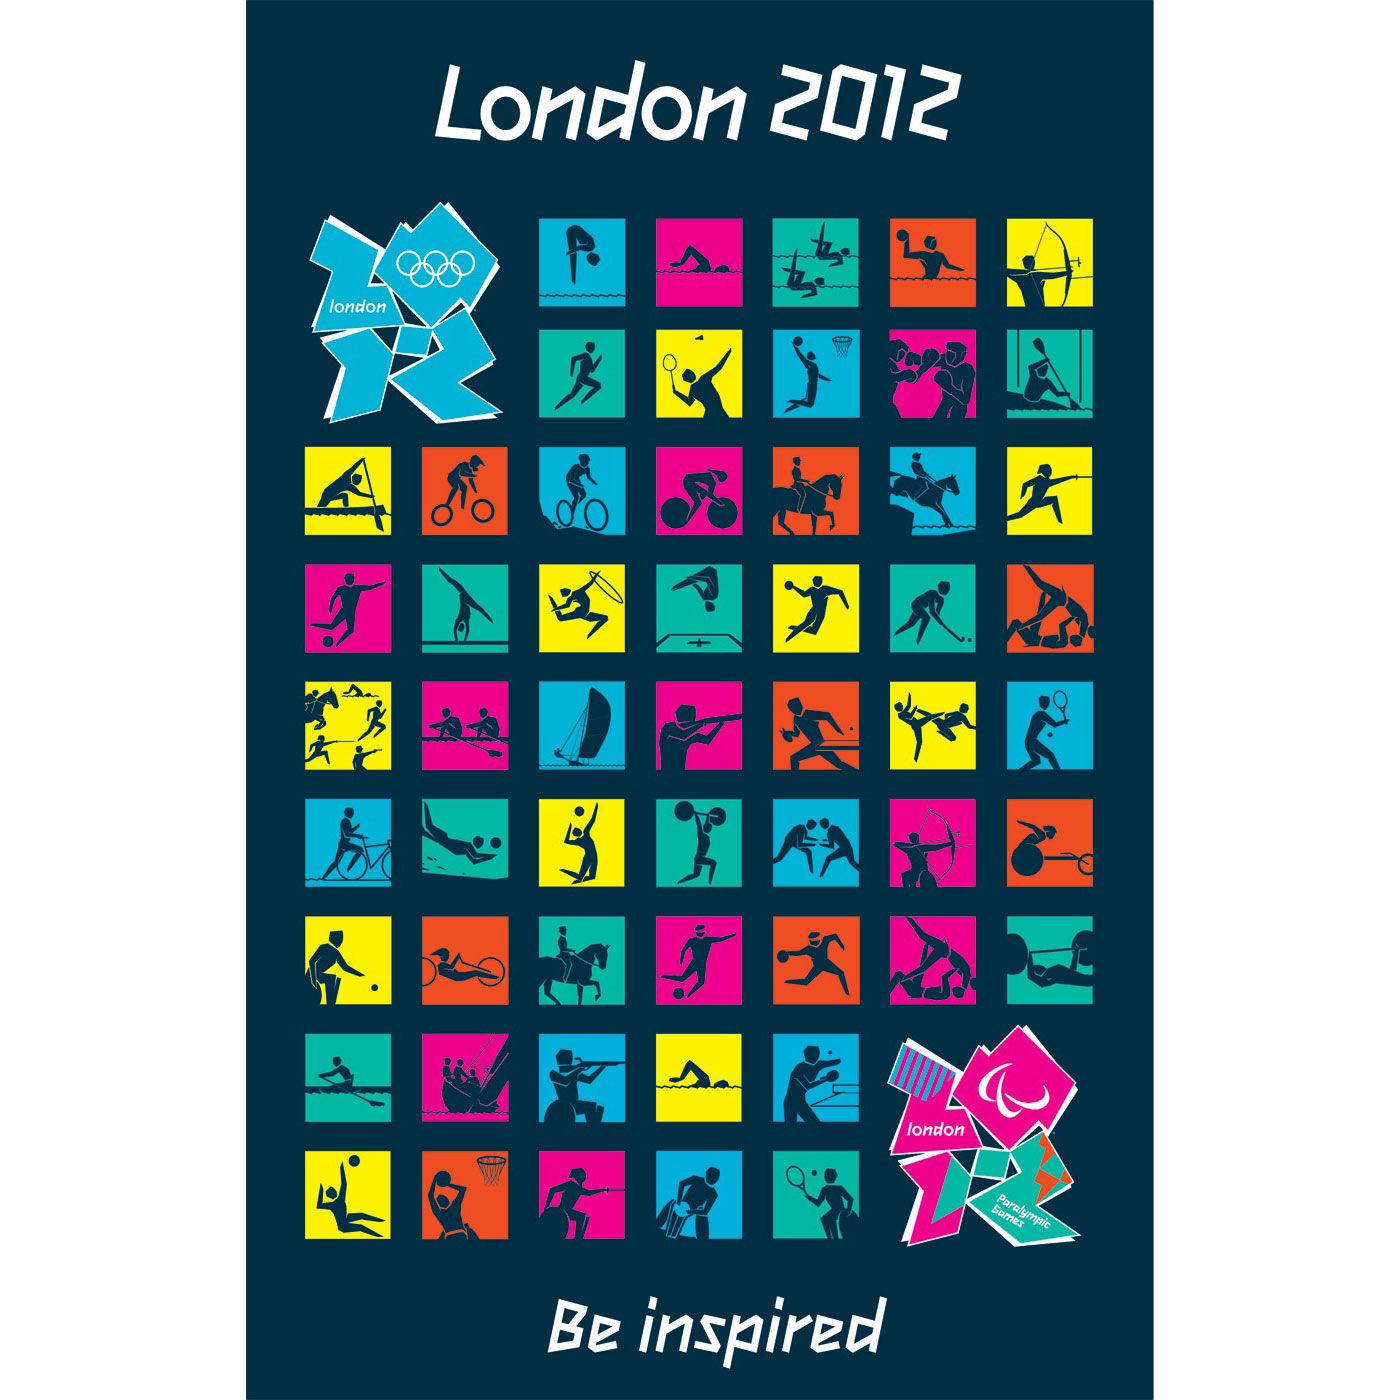 Londres 2012 Analisis Identidad